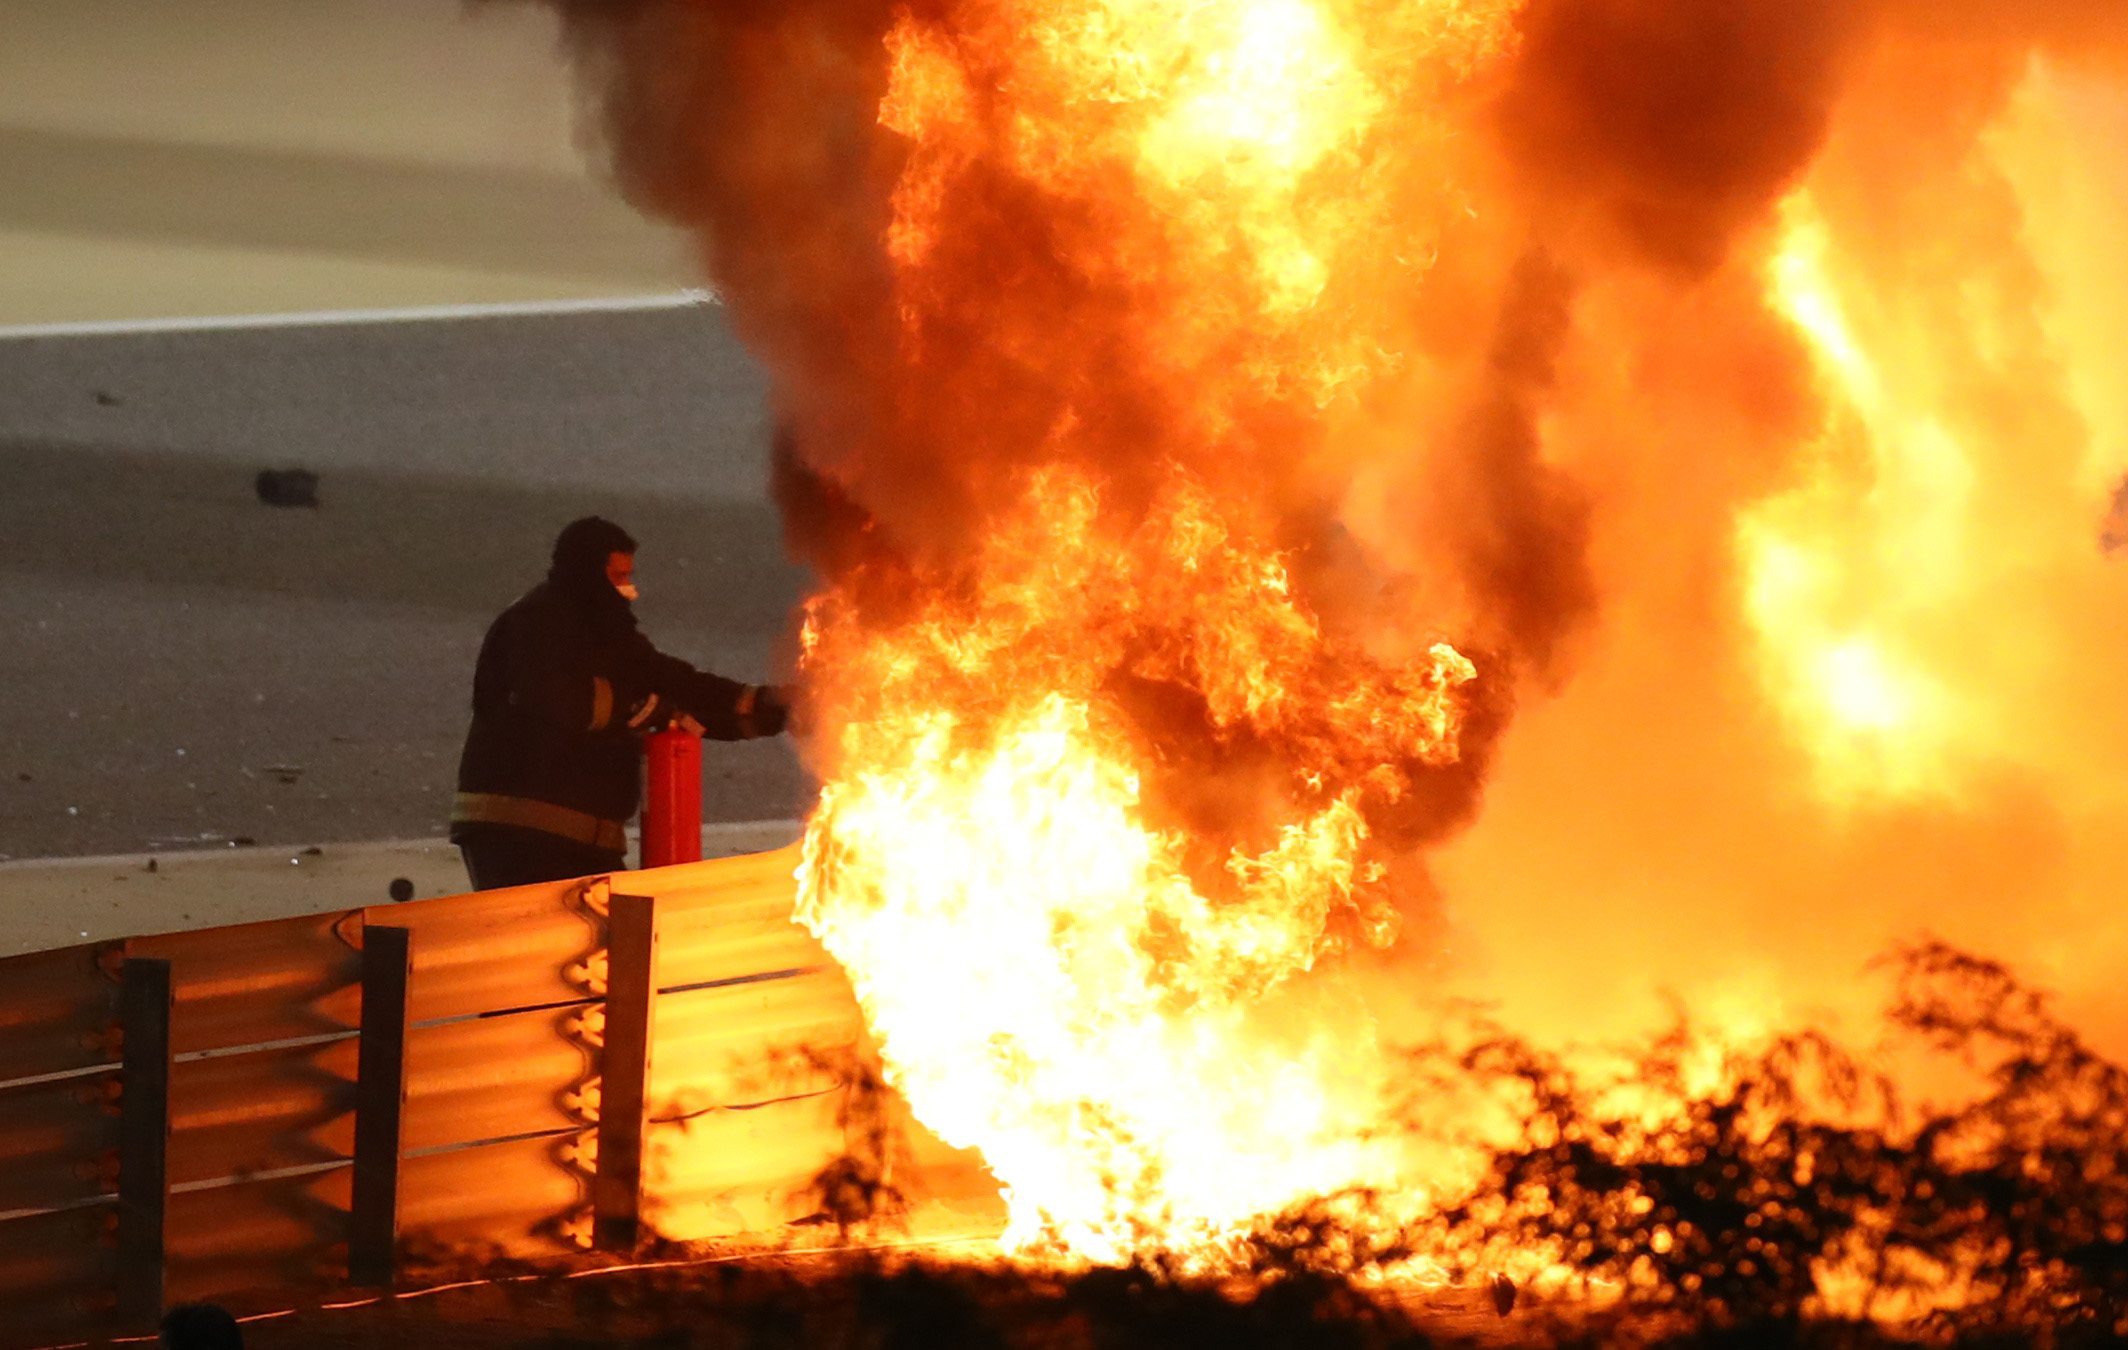 Formula 1: Συγκλονιστικές εικόνες από το ατύχημα στο Grand Prix του Μπαχρέιν (pics, vids)